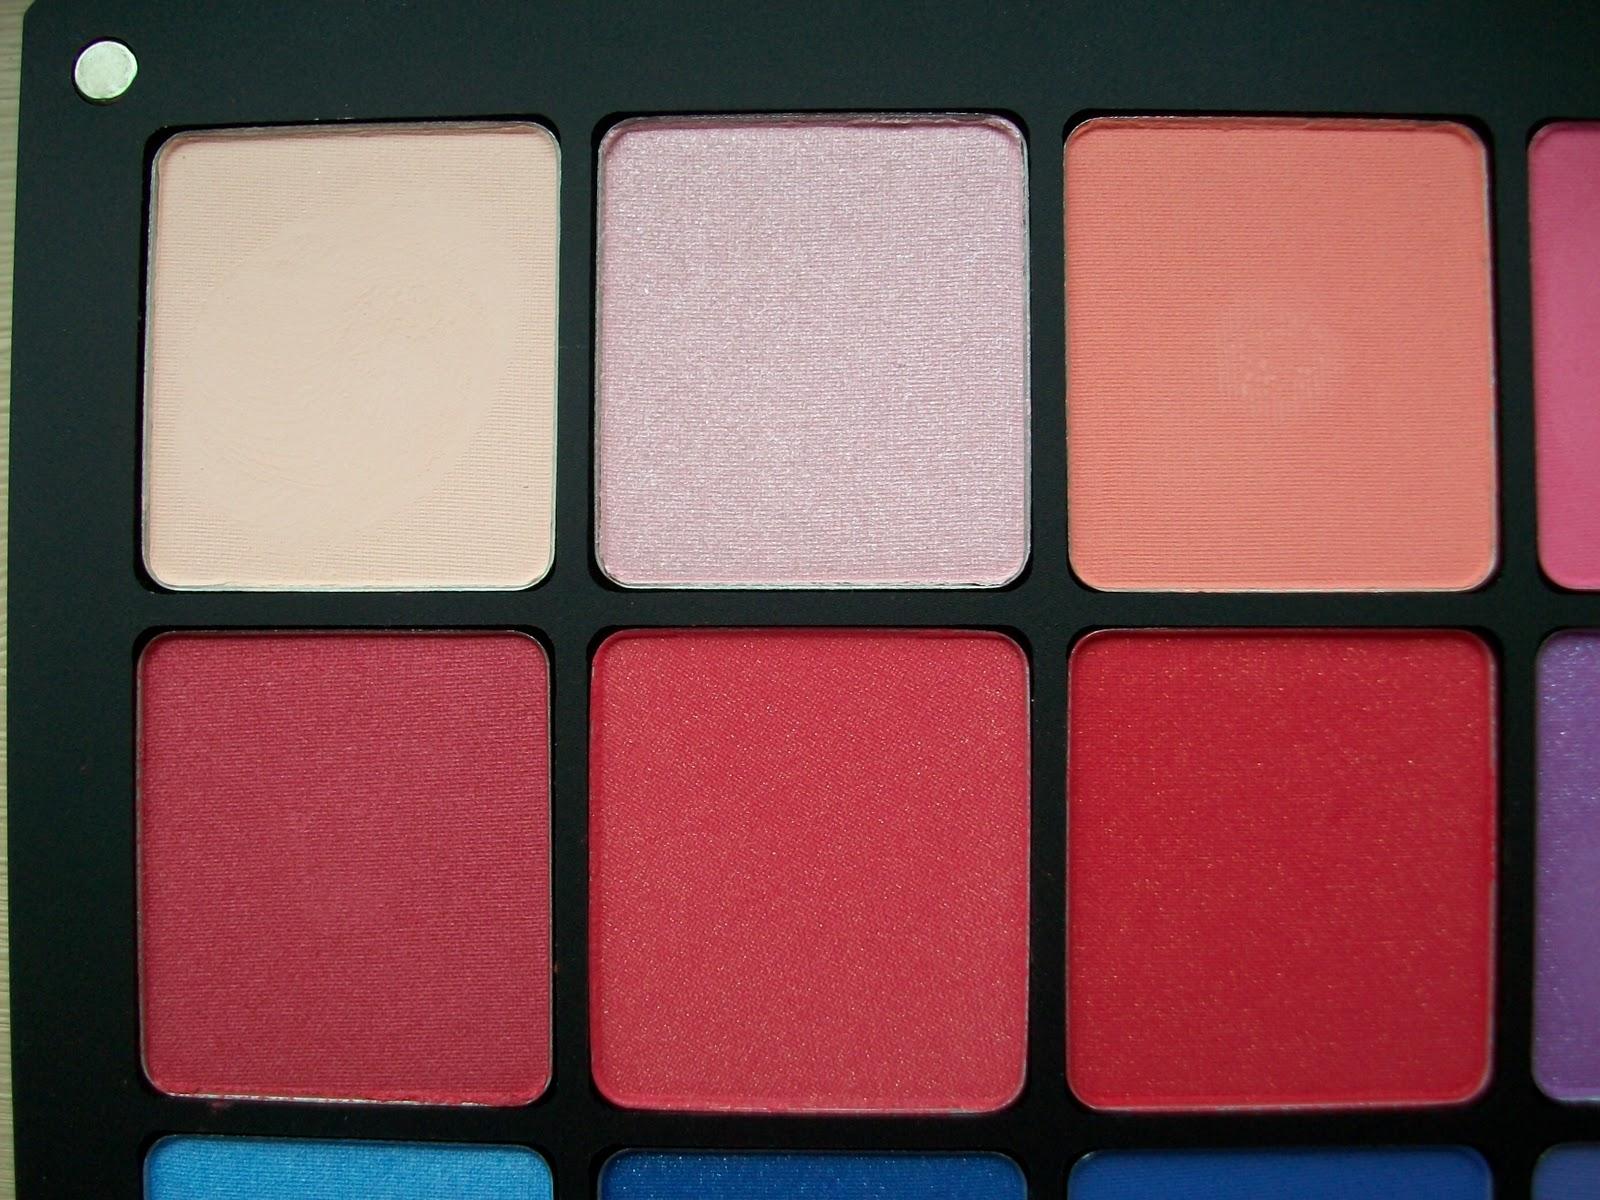 Maz Makeup Inglot Purple Pink U0026 Red Freedom Eyeshadow Palette - Review U0026 Swatches